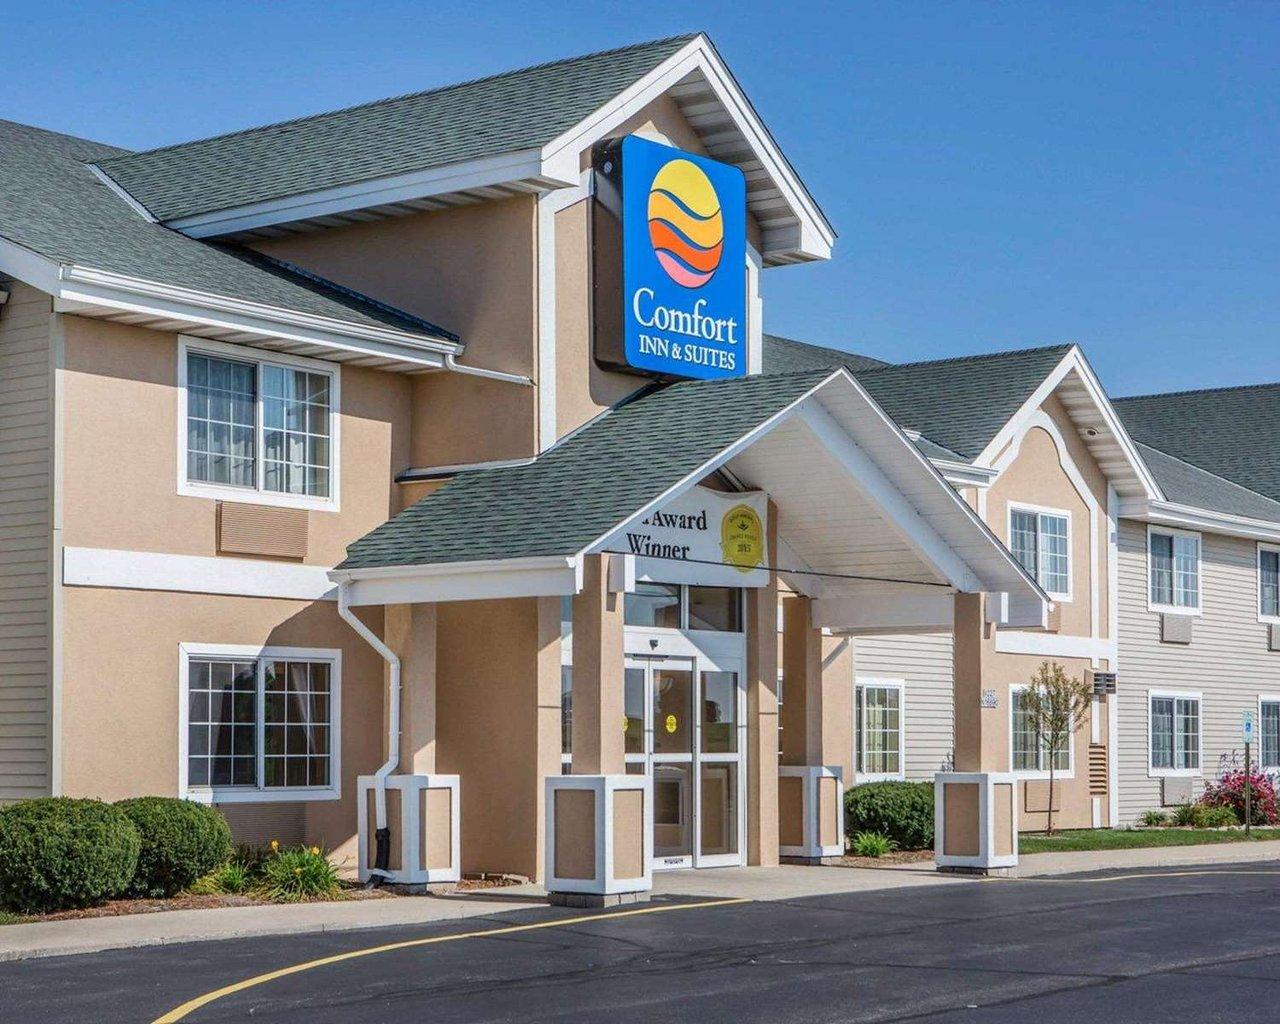 comfort inn suites 84 9 4 updated 2019 prices hotel rh tripadvisor com